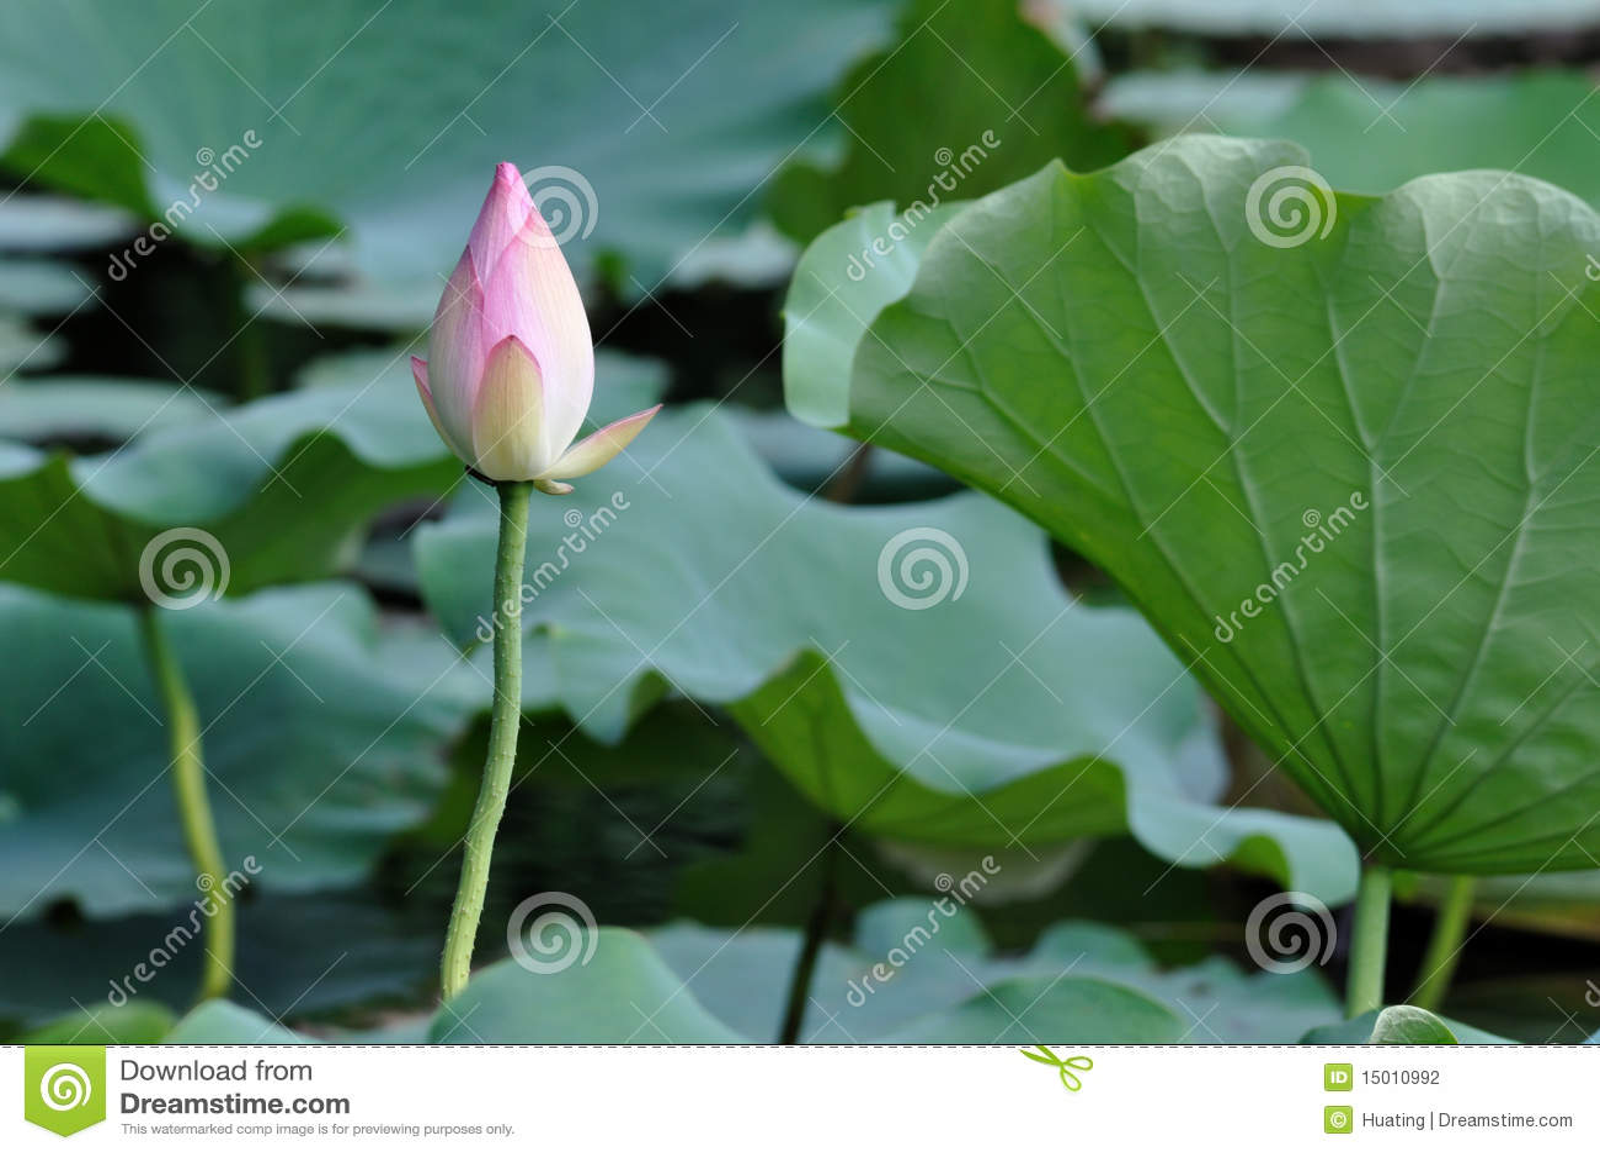 Lotus flower bud stock photo image of china creek botanical lotus flower bud izmirmasajfo